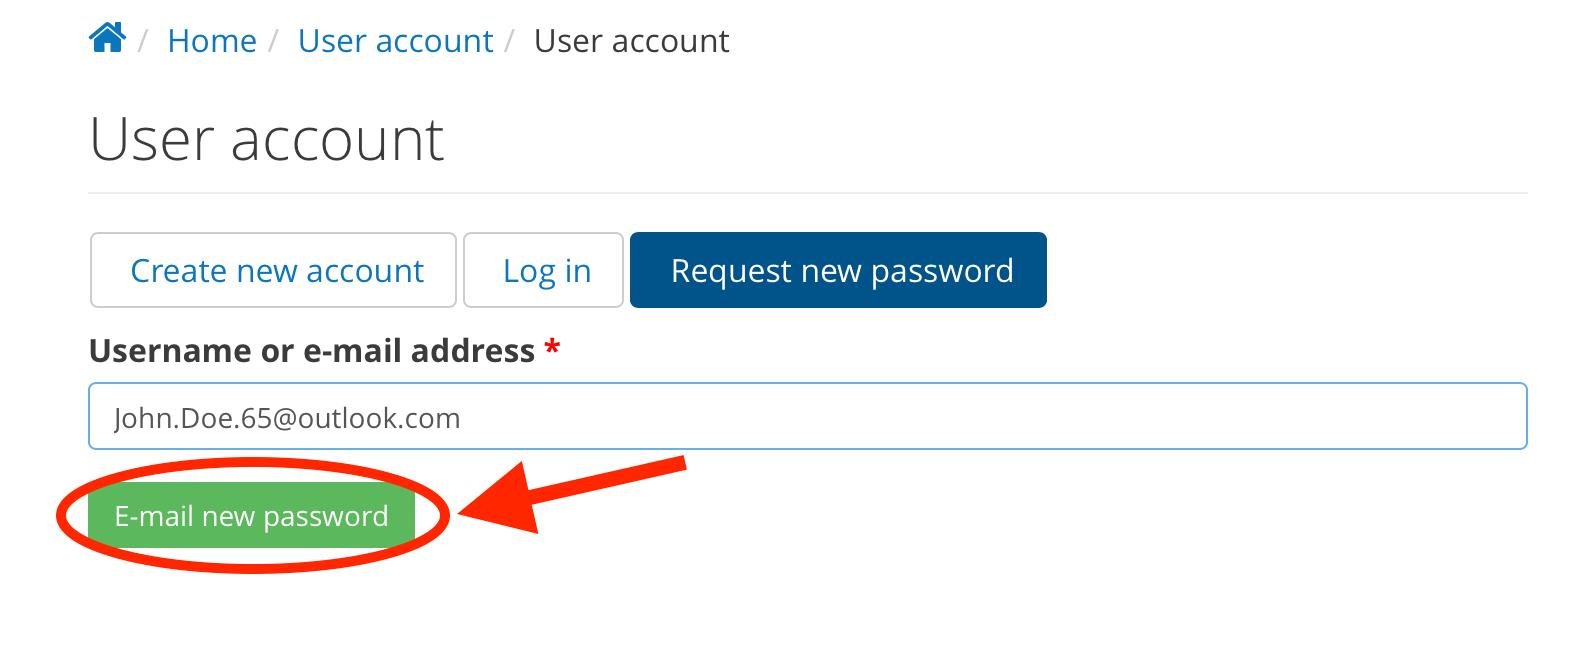 Enter username or e-mail address